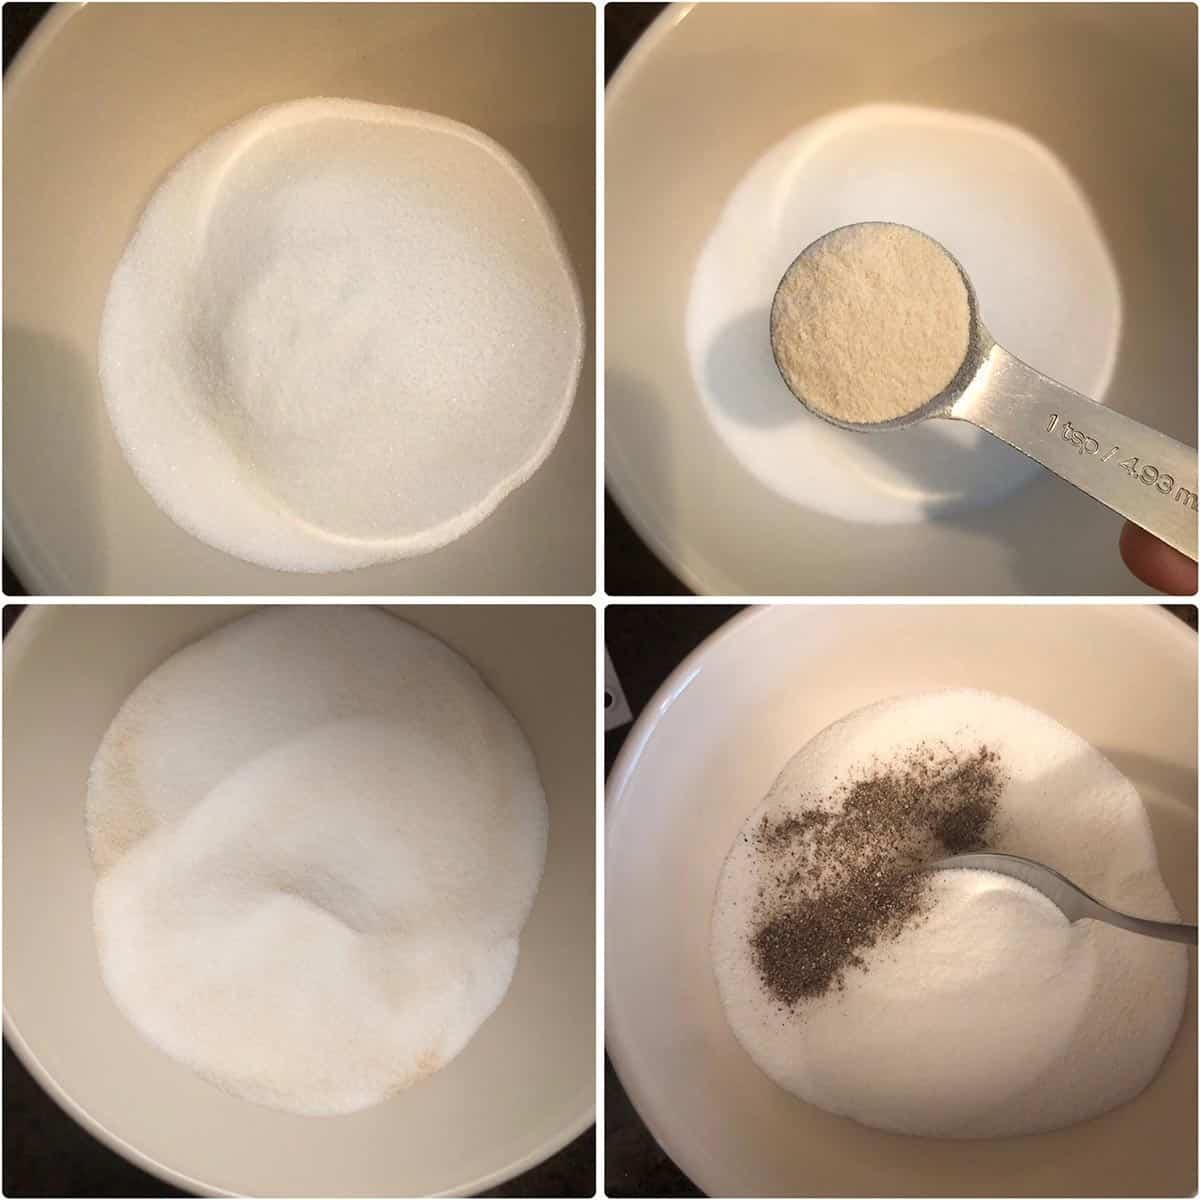 adding pectin powder and cardamom to sugar